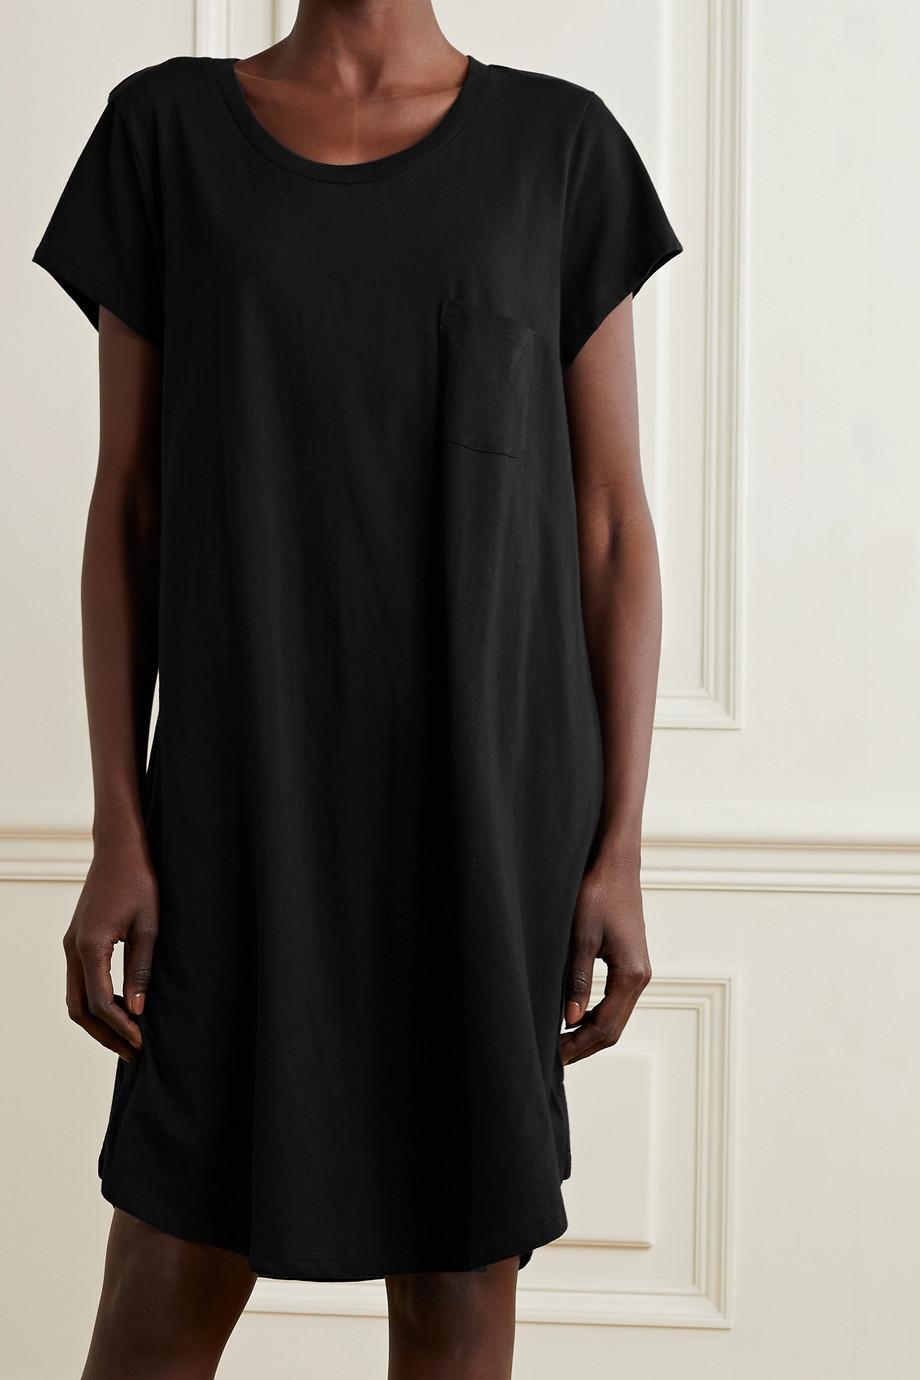 Skin + NET SUSTAIN Carissa organic Pima cotton-jersey nightdress